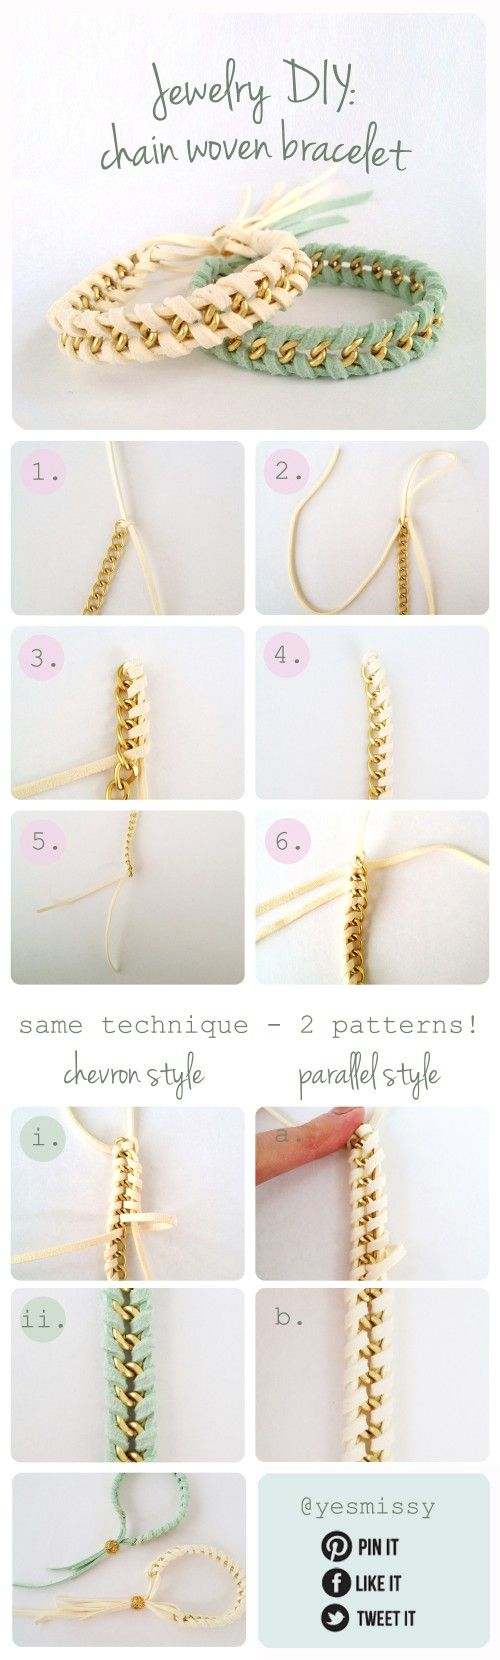 Jewelry DIY: Chain Woven Bracelet Tutorial Source confirmed 3/9/2013